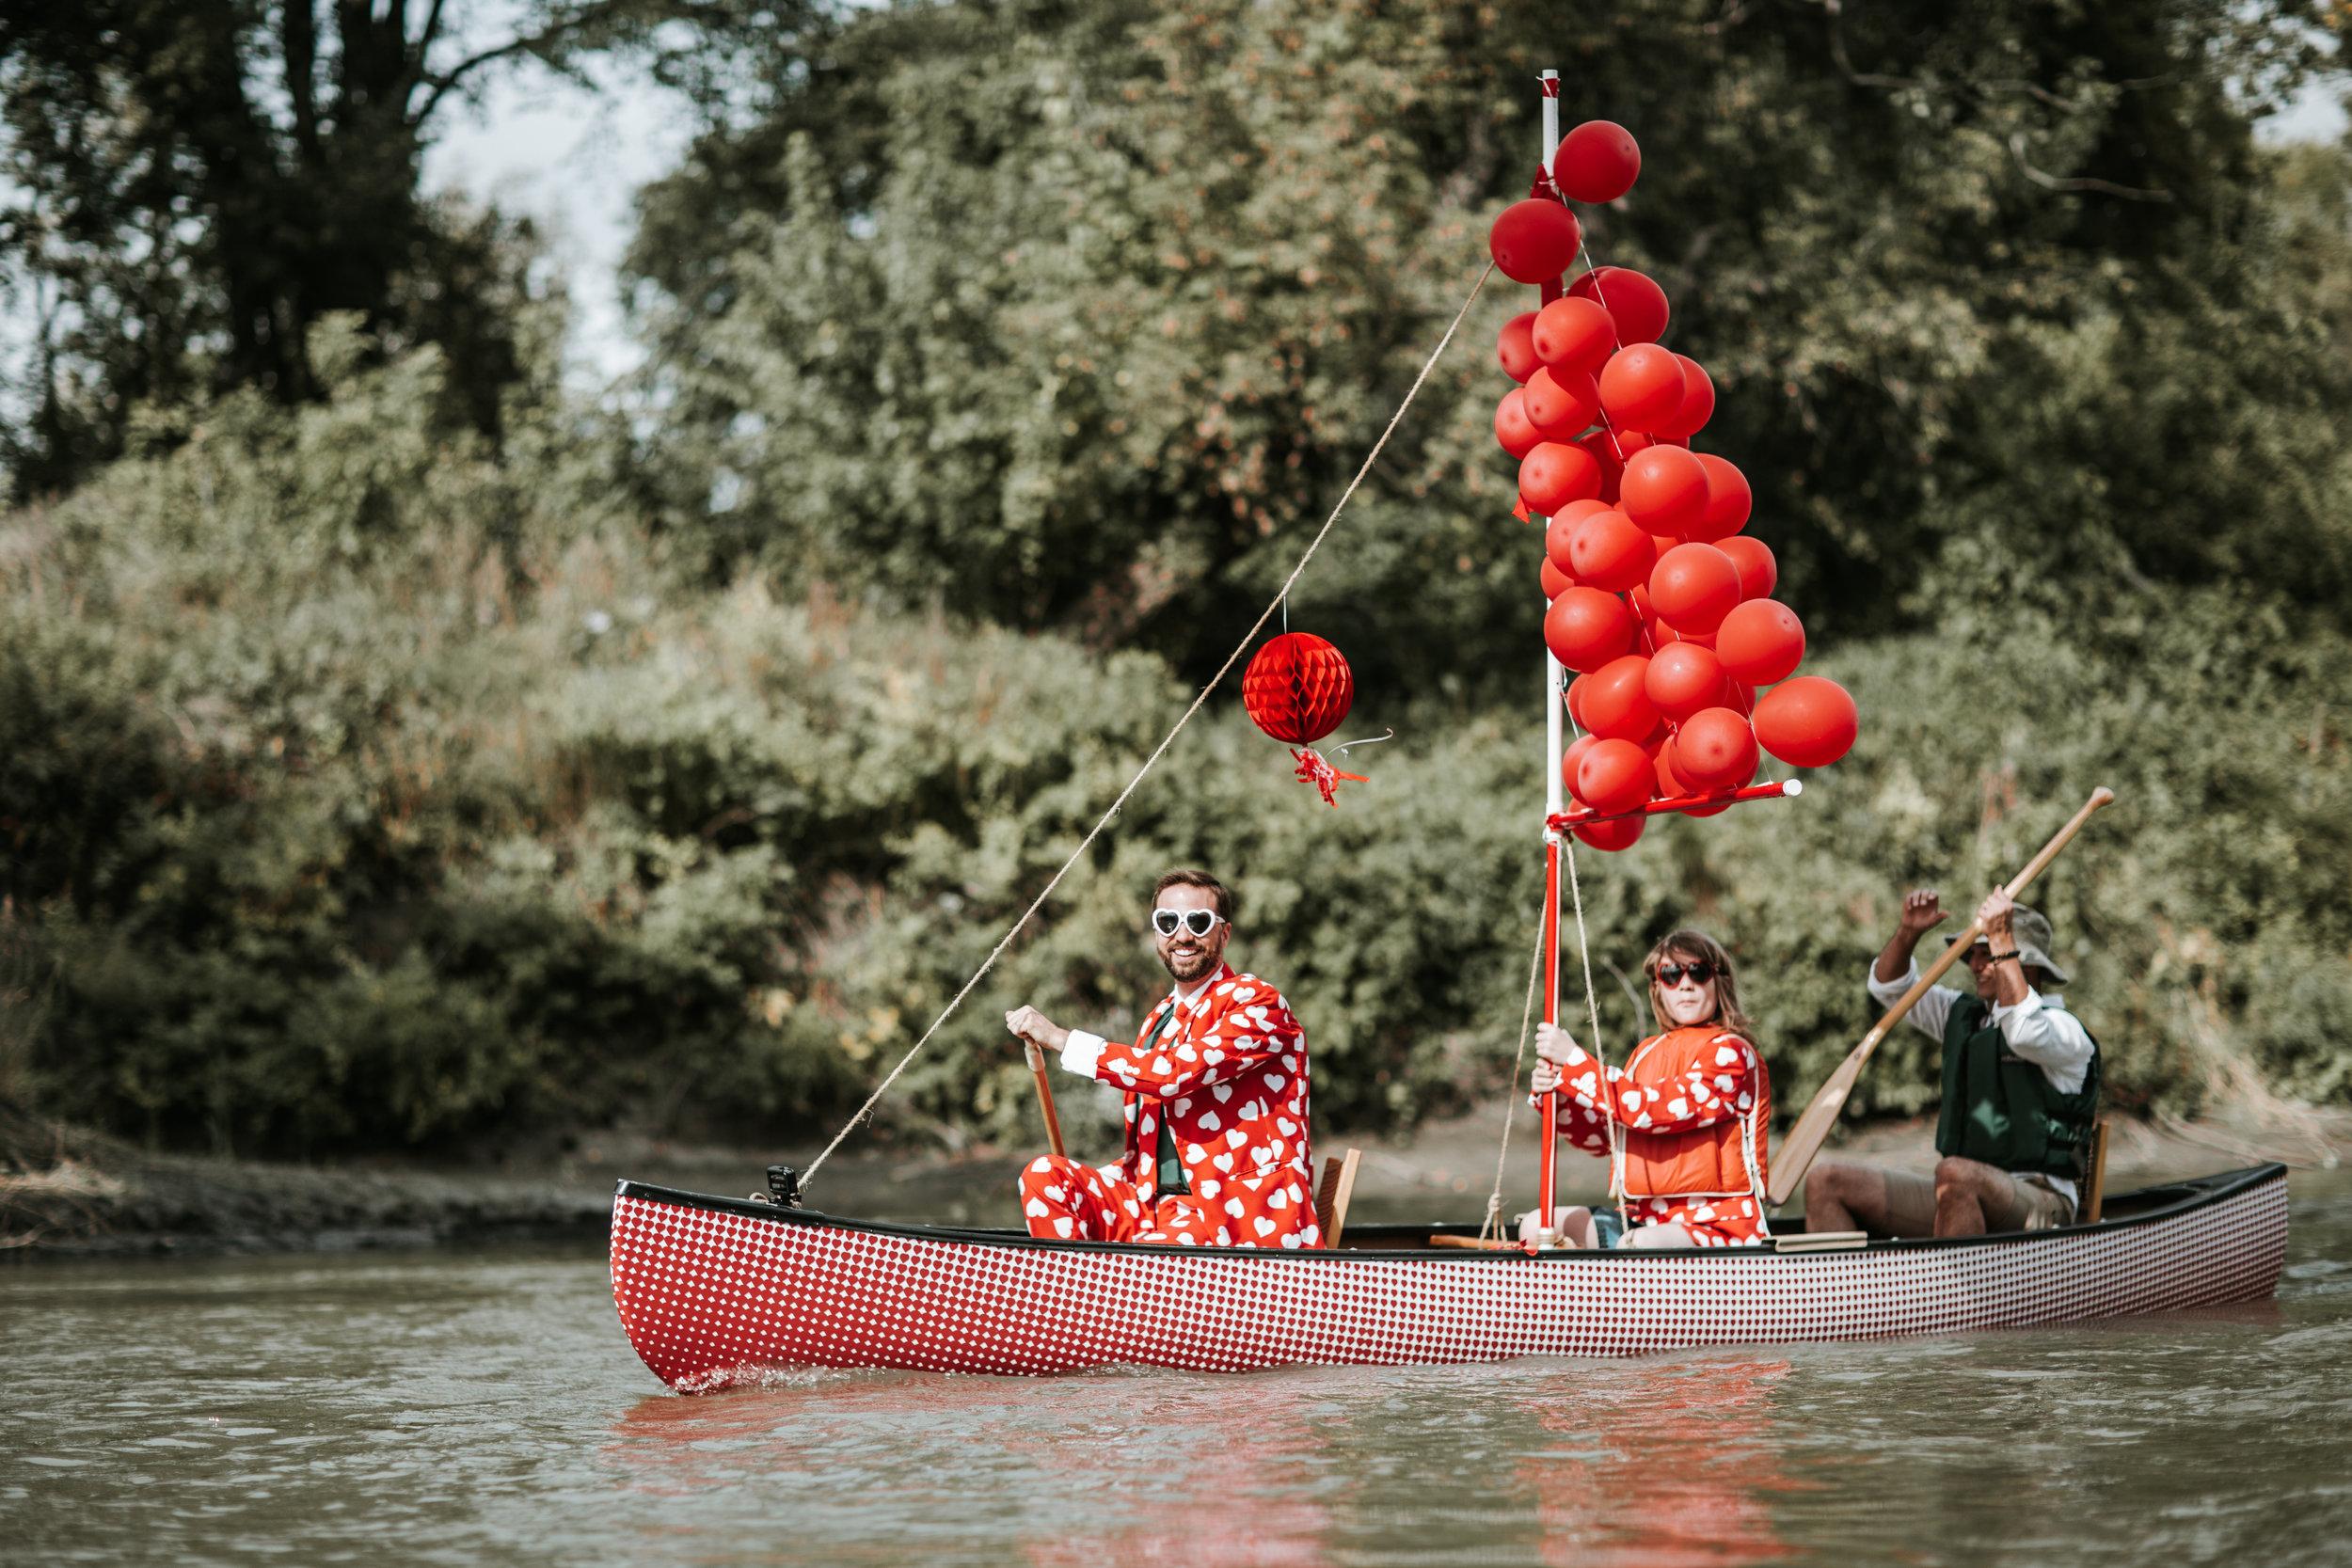 canoeparade-6356.jpg